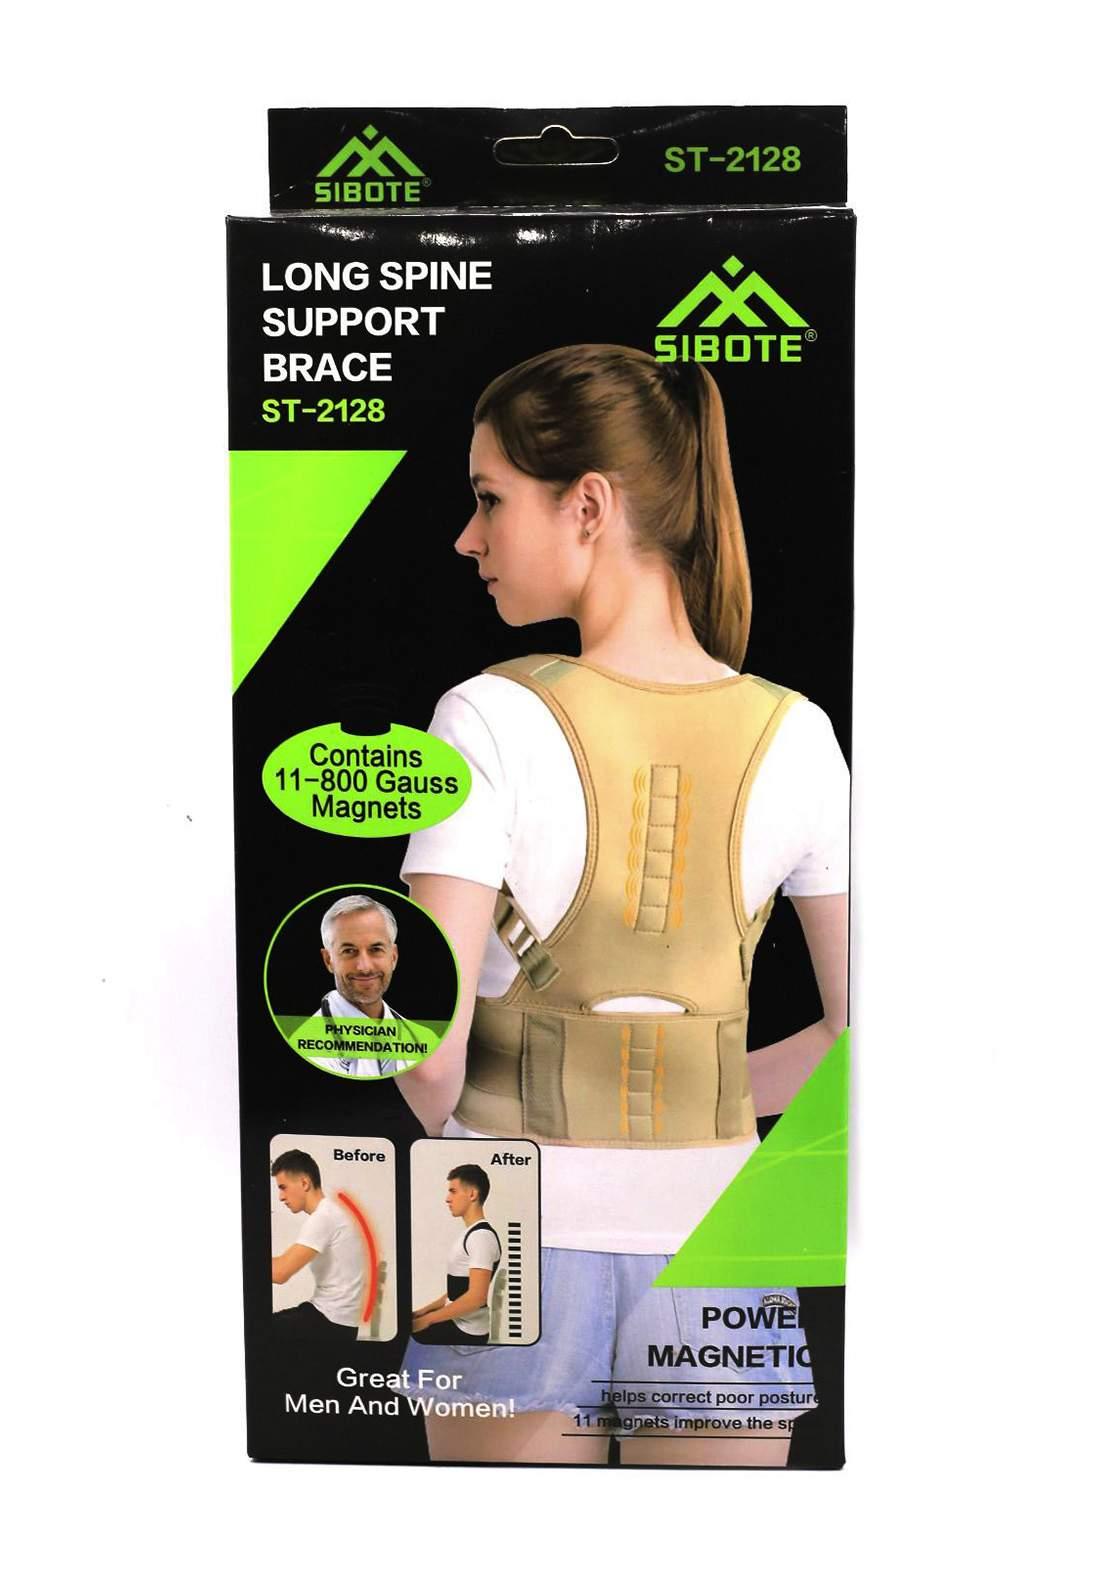 Sibote ST2128 Power Magnetic Long Spine Support Brace مشد و حزام الظهر المغناطيسي لتقويم الظهر